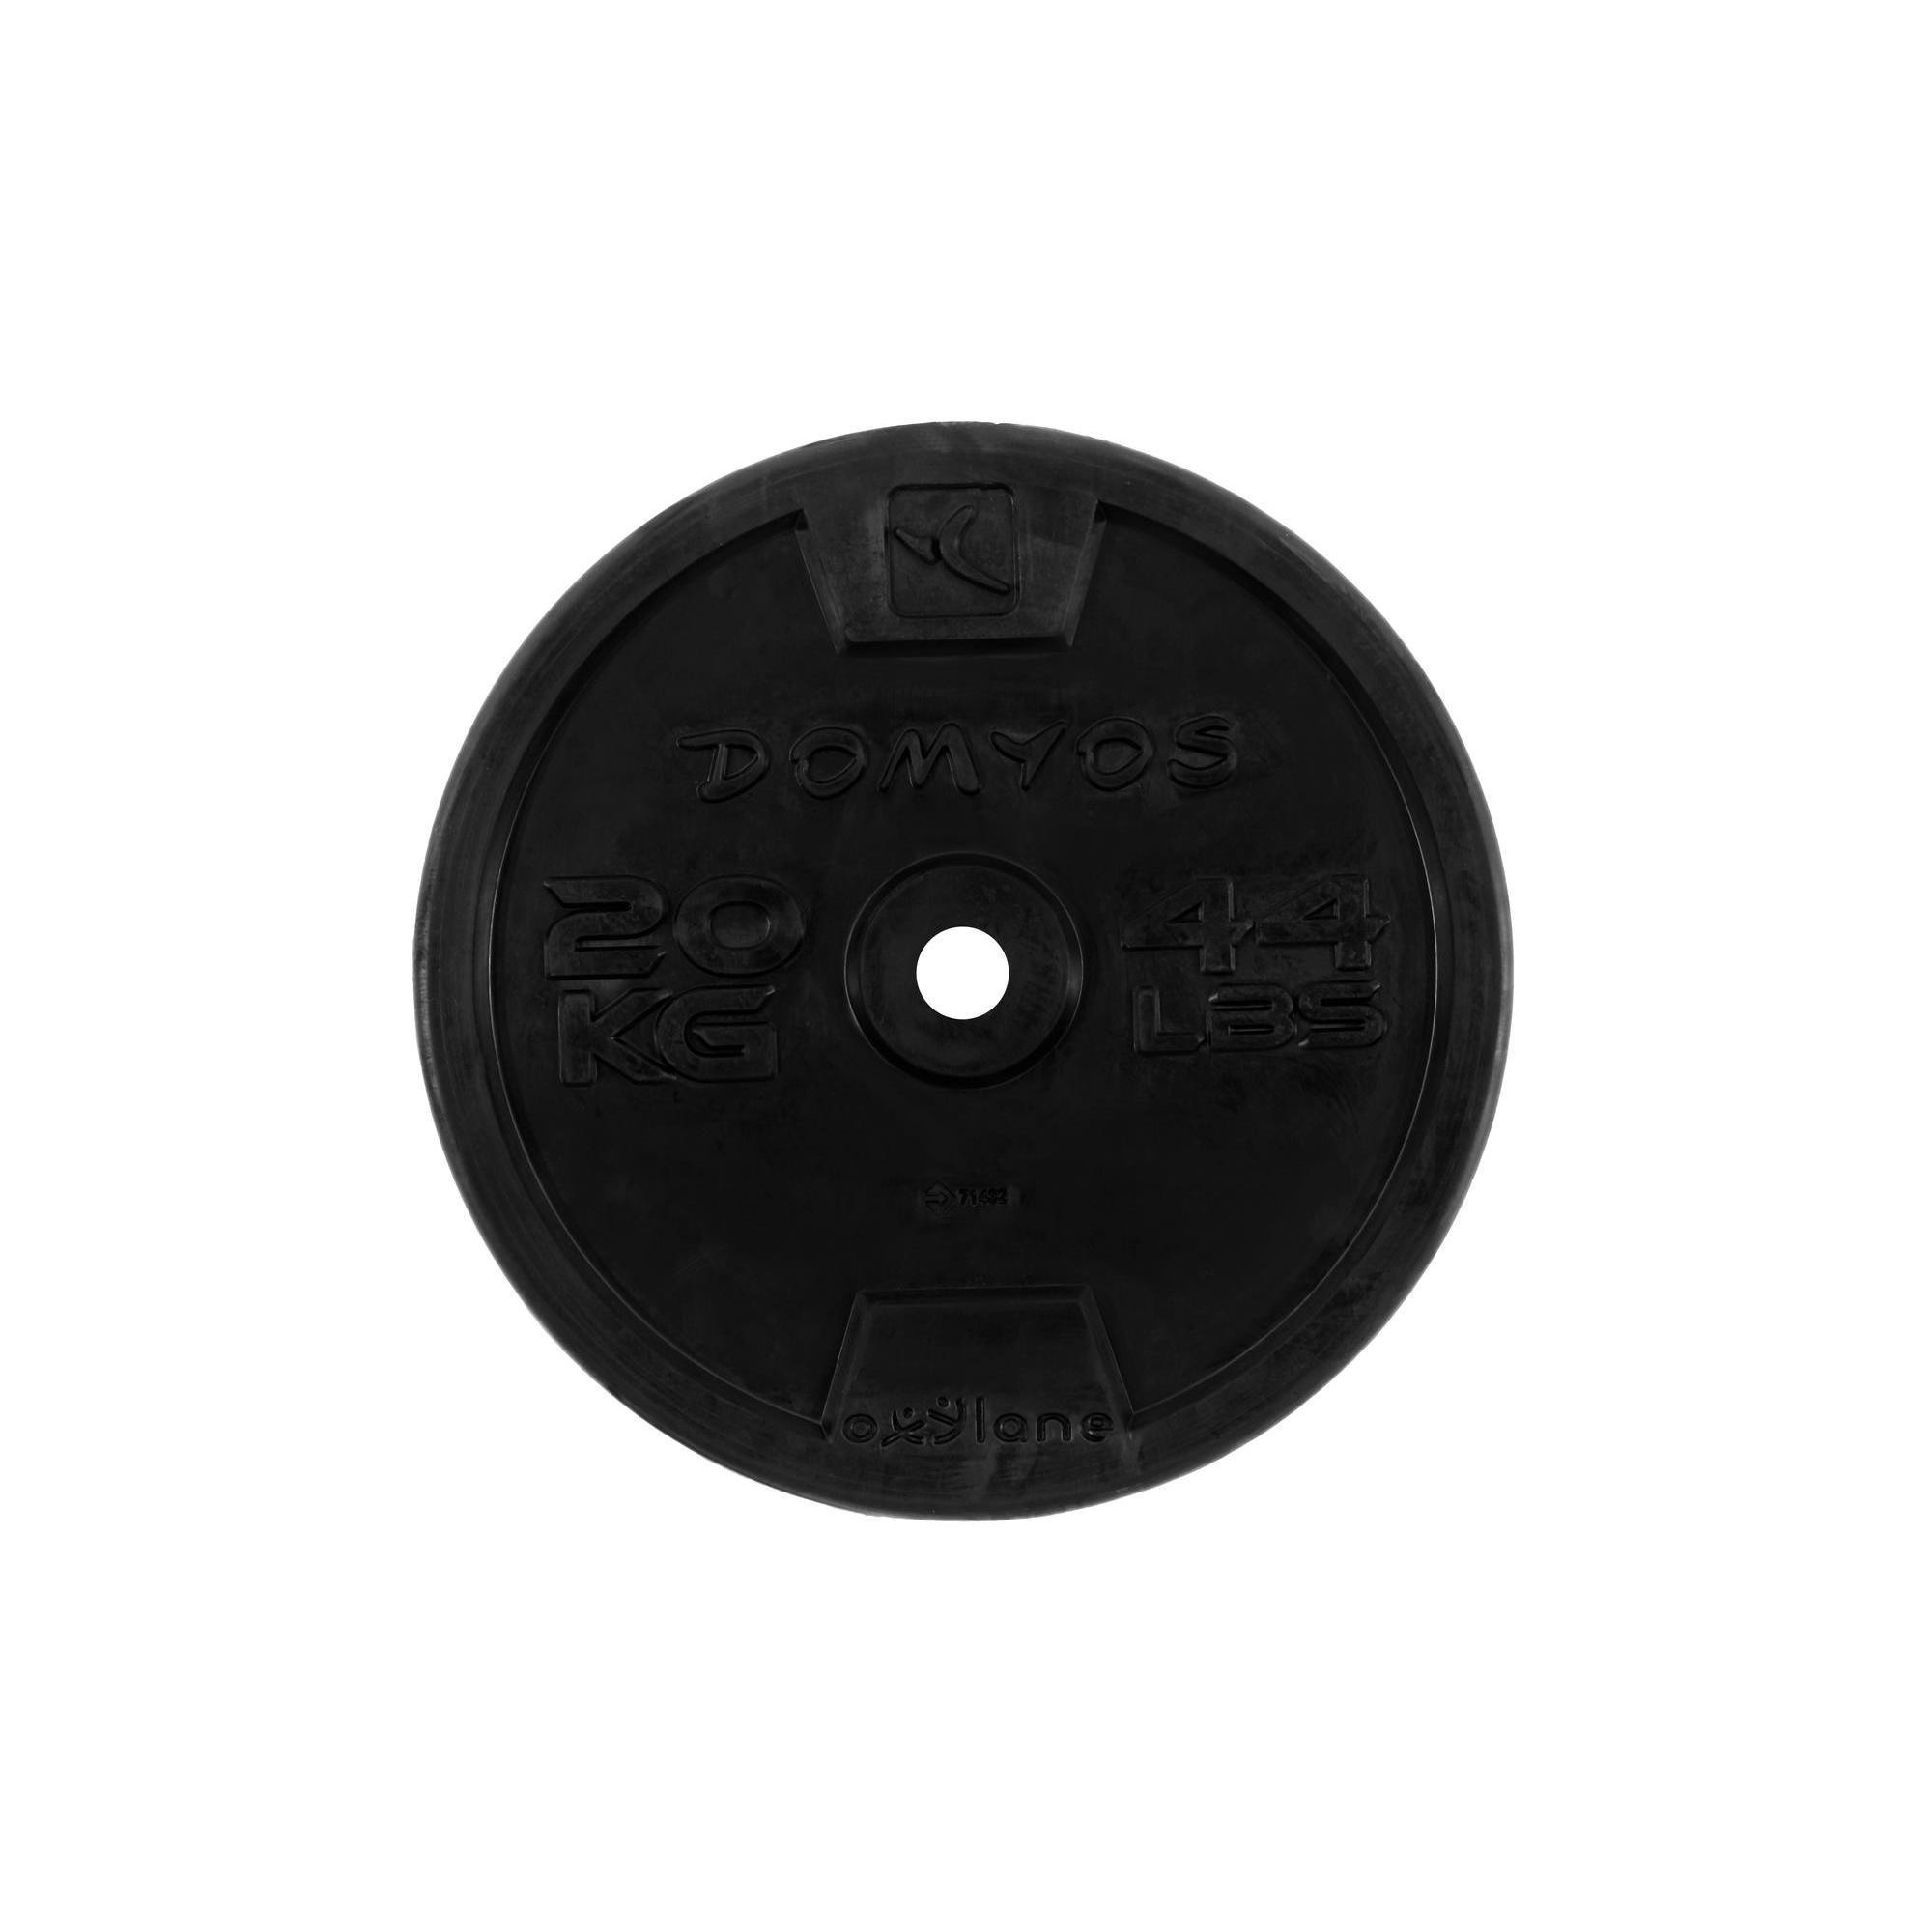 disque caoutchouc de musculation 28 mm domyos by decathlon. Black Bedroom Furniture Sets. Home Design Ideas